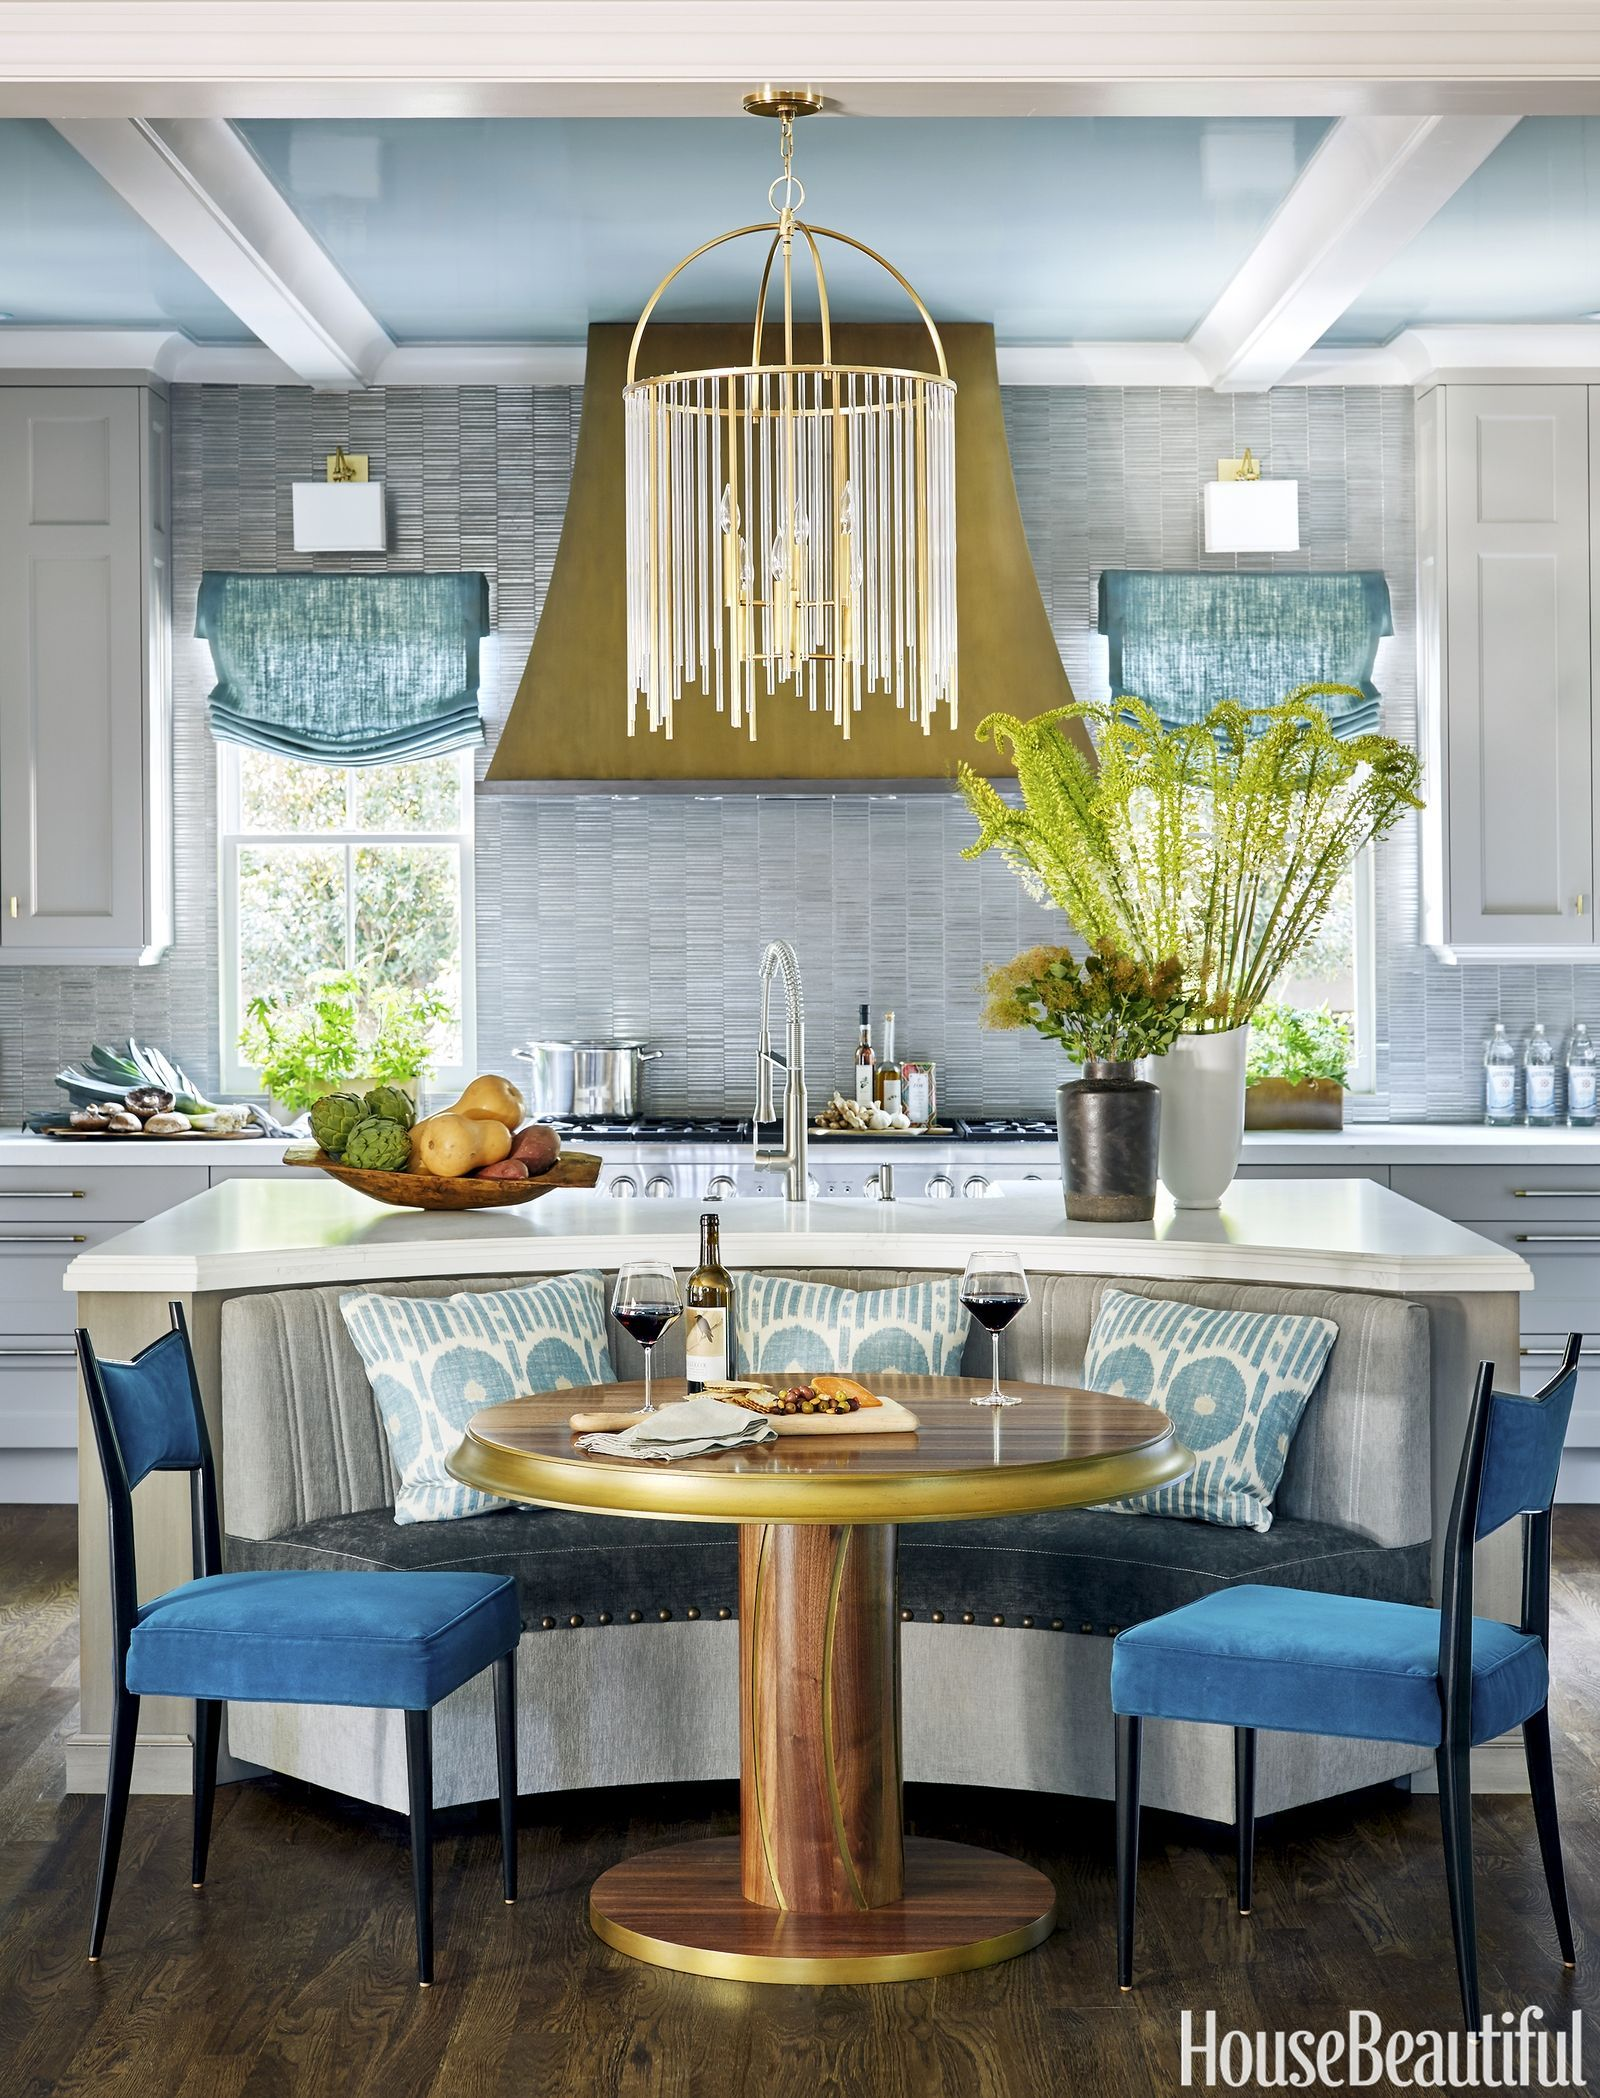 55 Chic Kitchen Backsplash Ideas That Will Transform The Entire Room Kitchen Banquette Kitchen Island With Seating Kitchen Remodel